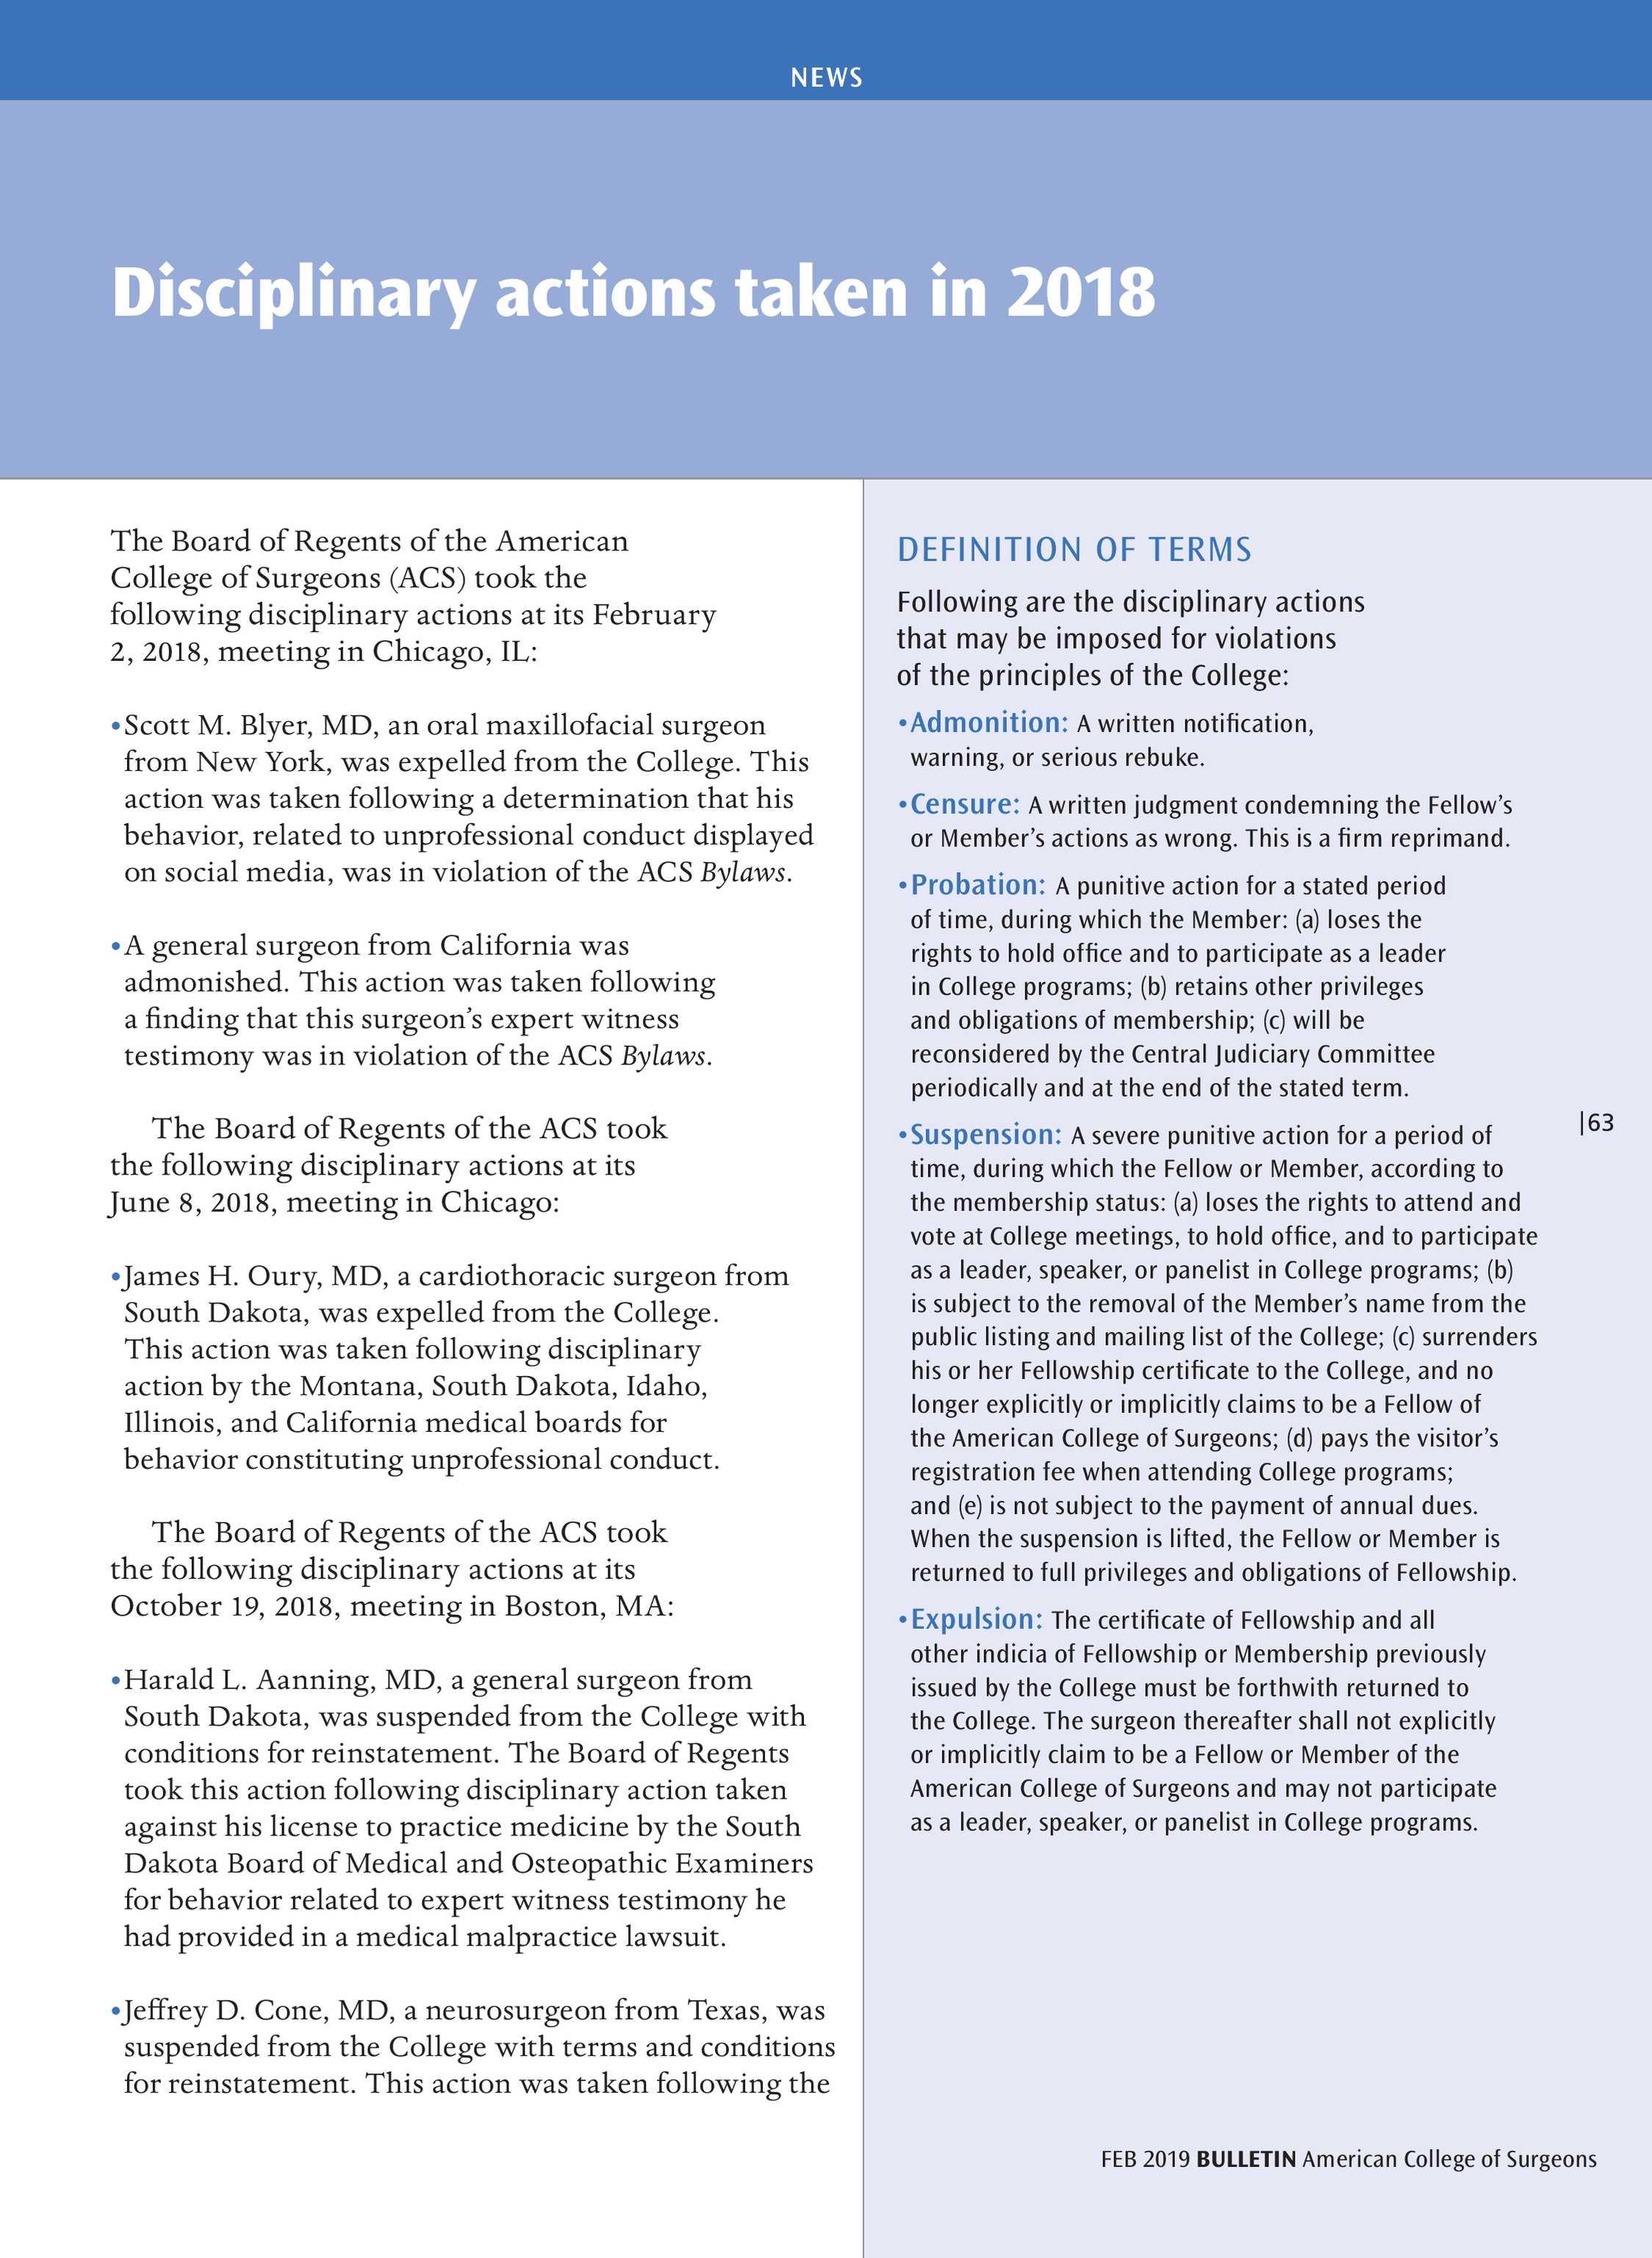 ACS Bulletin - February 2019 - page 63